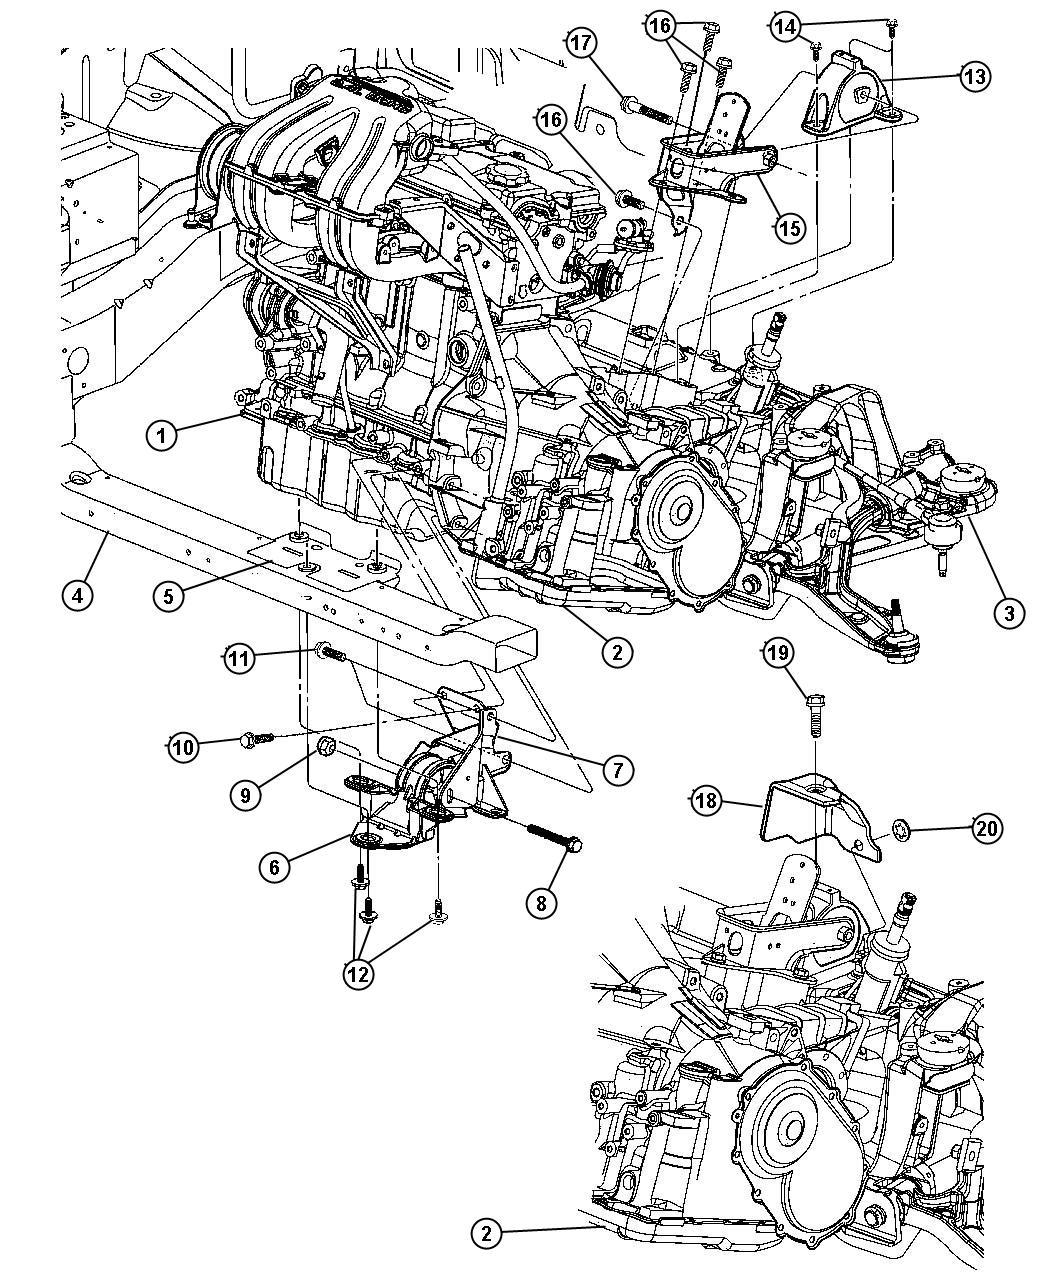 2002 chrysler voyager engine diagram